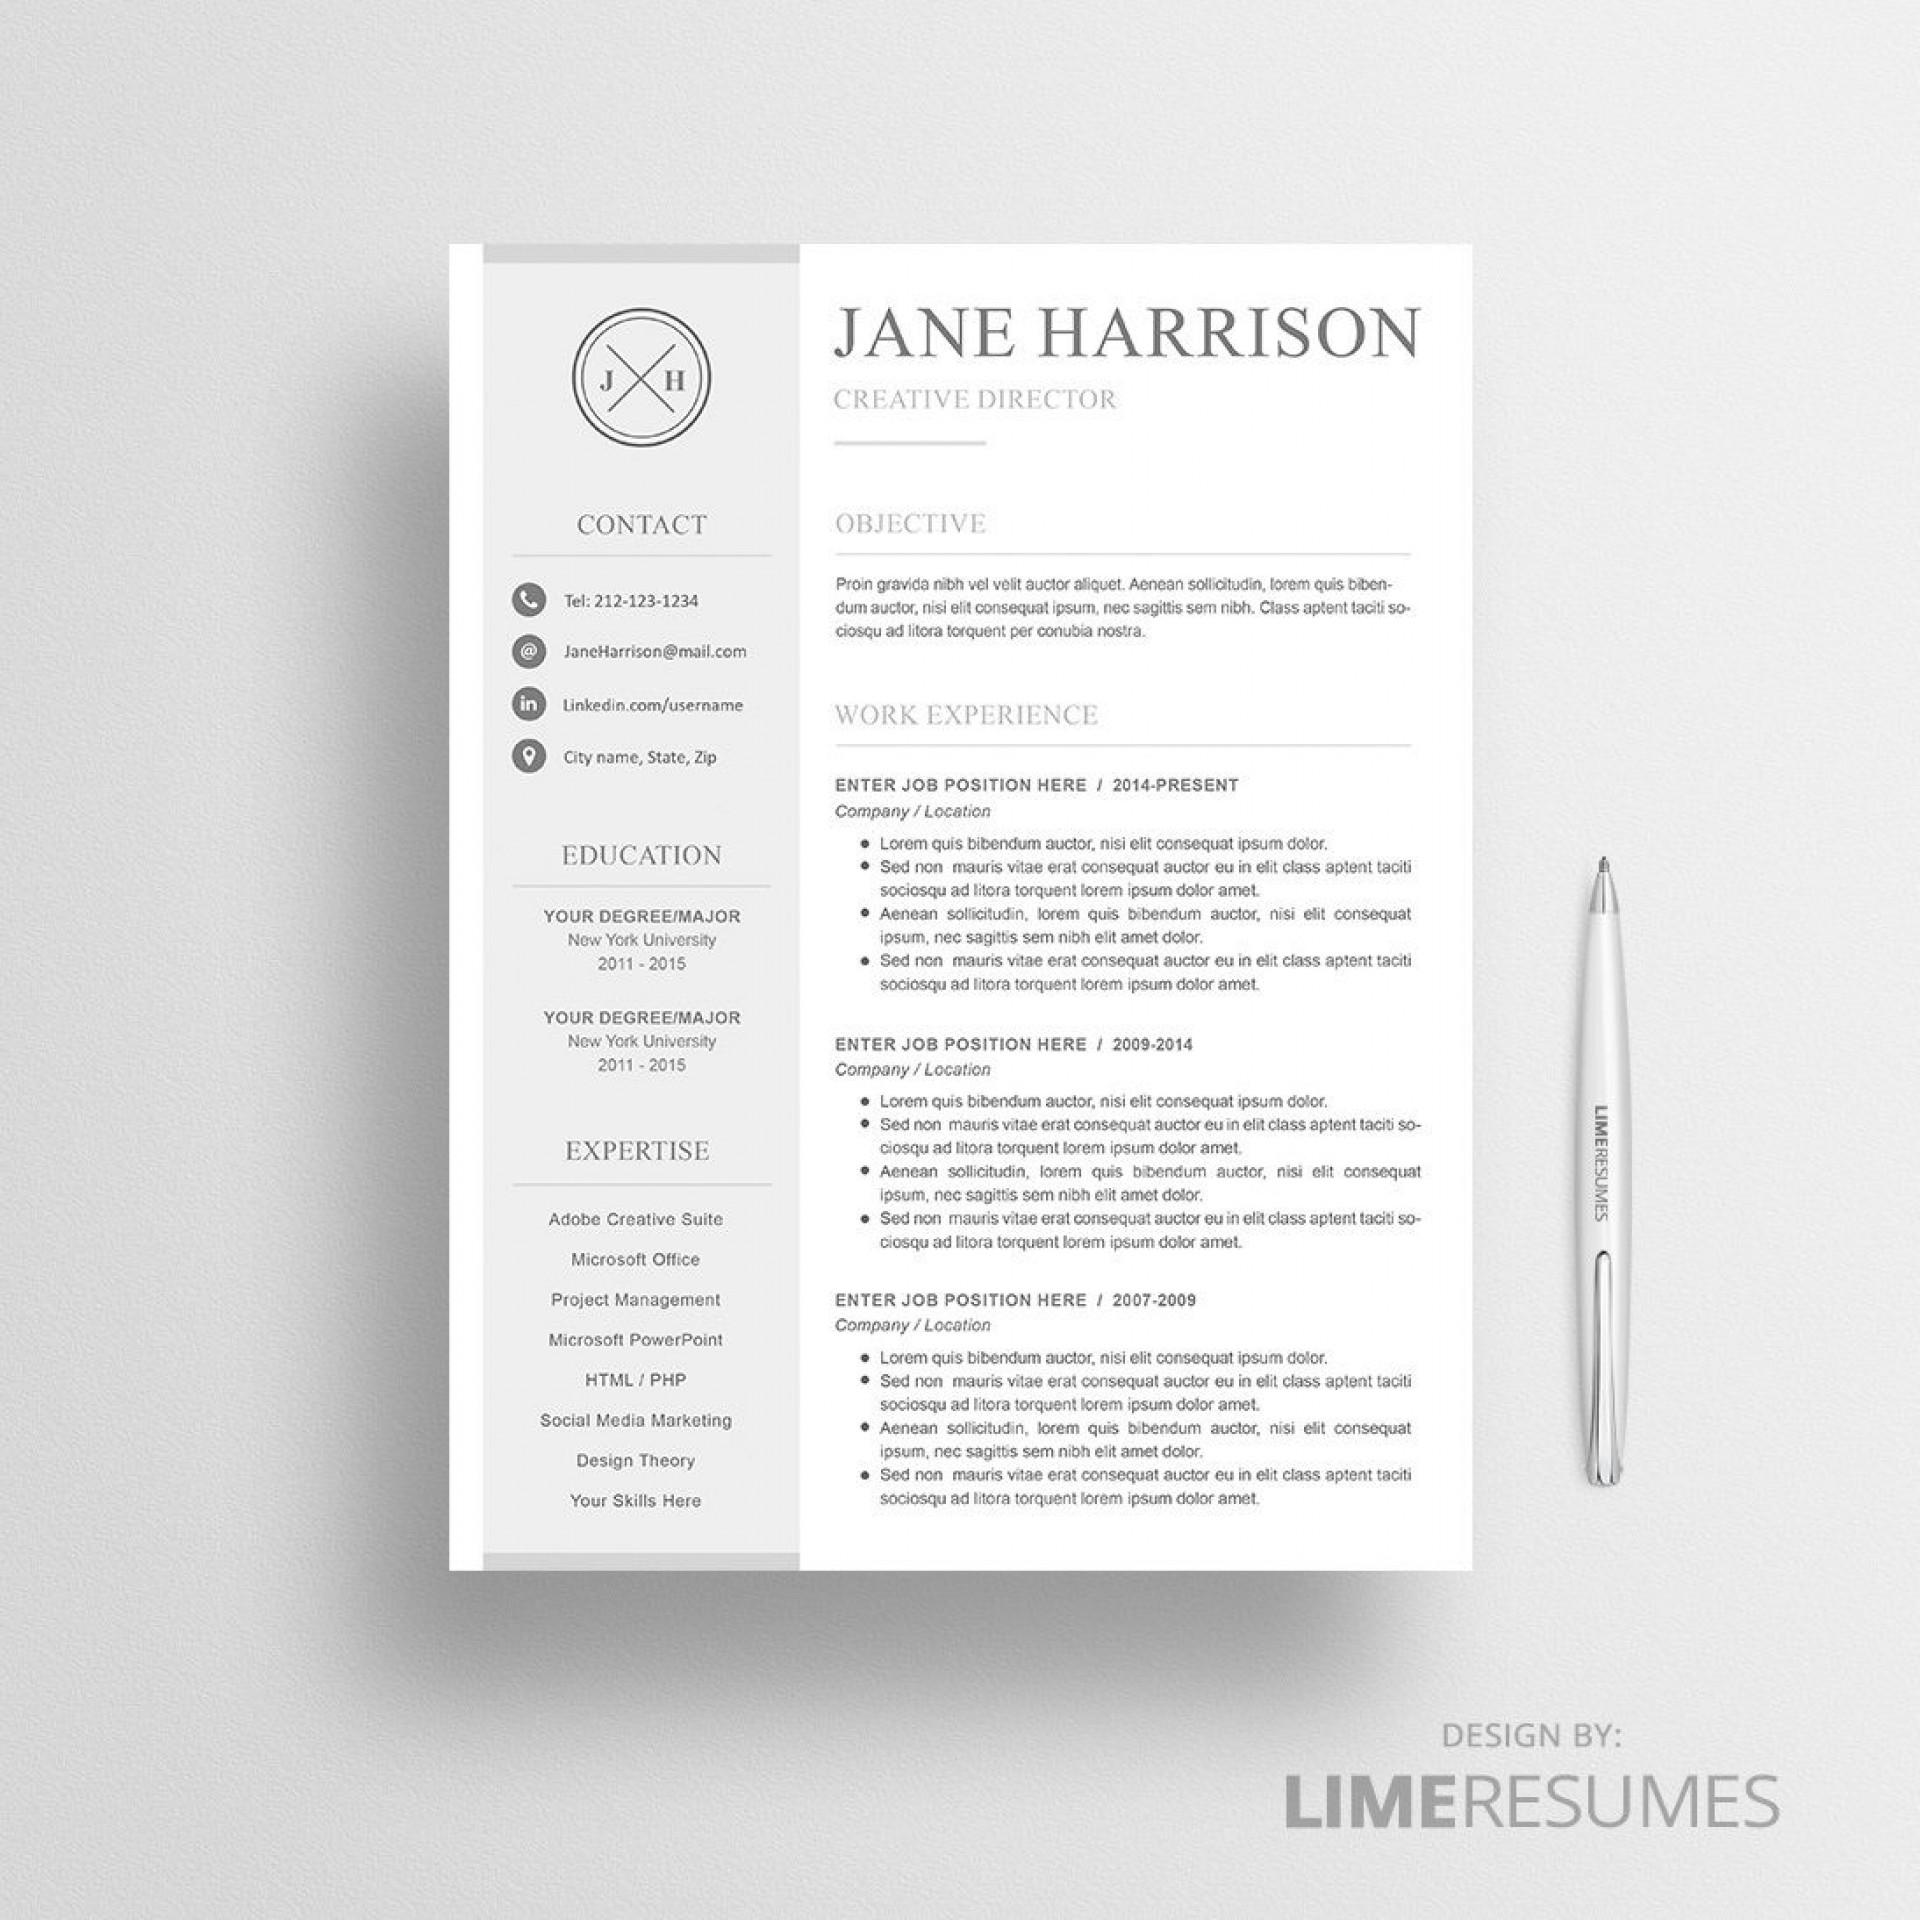 008 Astounding Resume Template On Word Design  Free Download Australia Microsoft Office 2007 Philippine1920